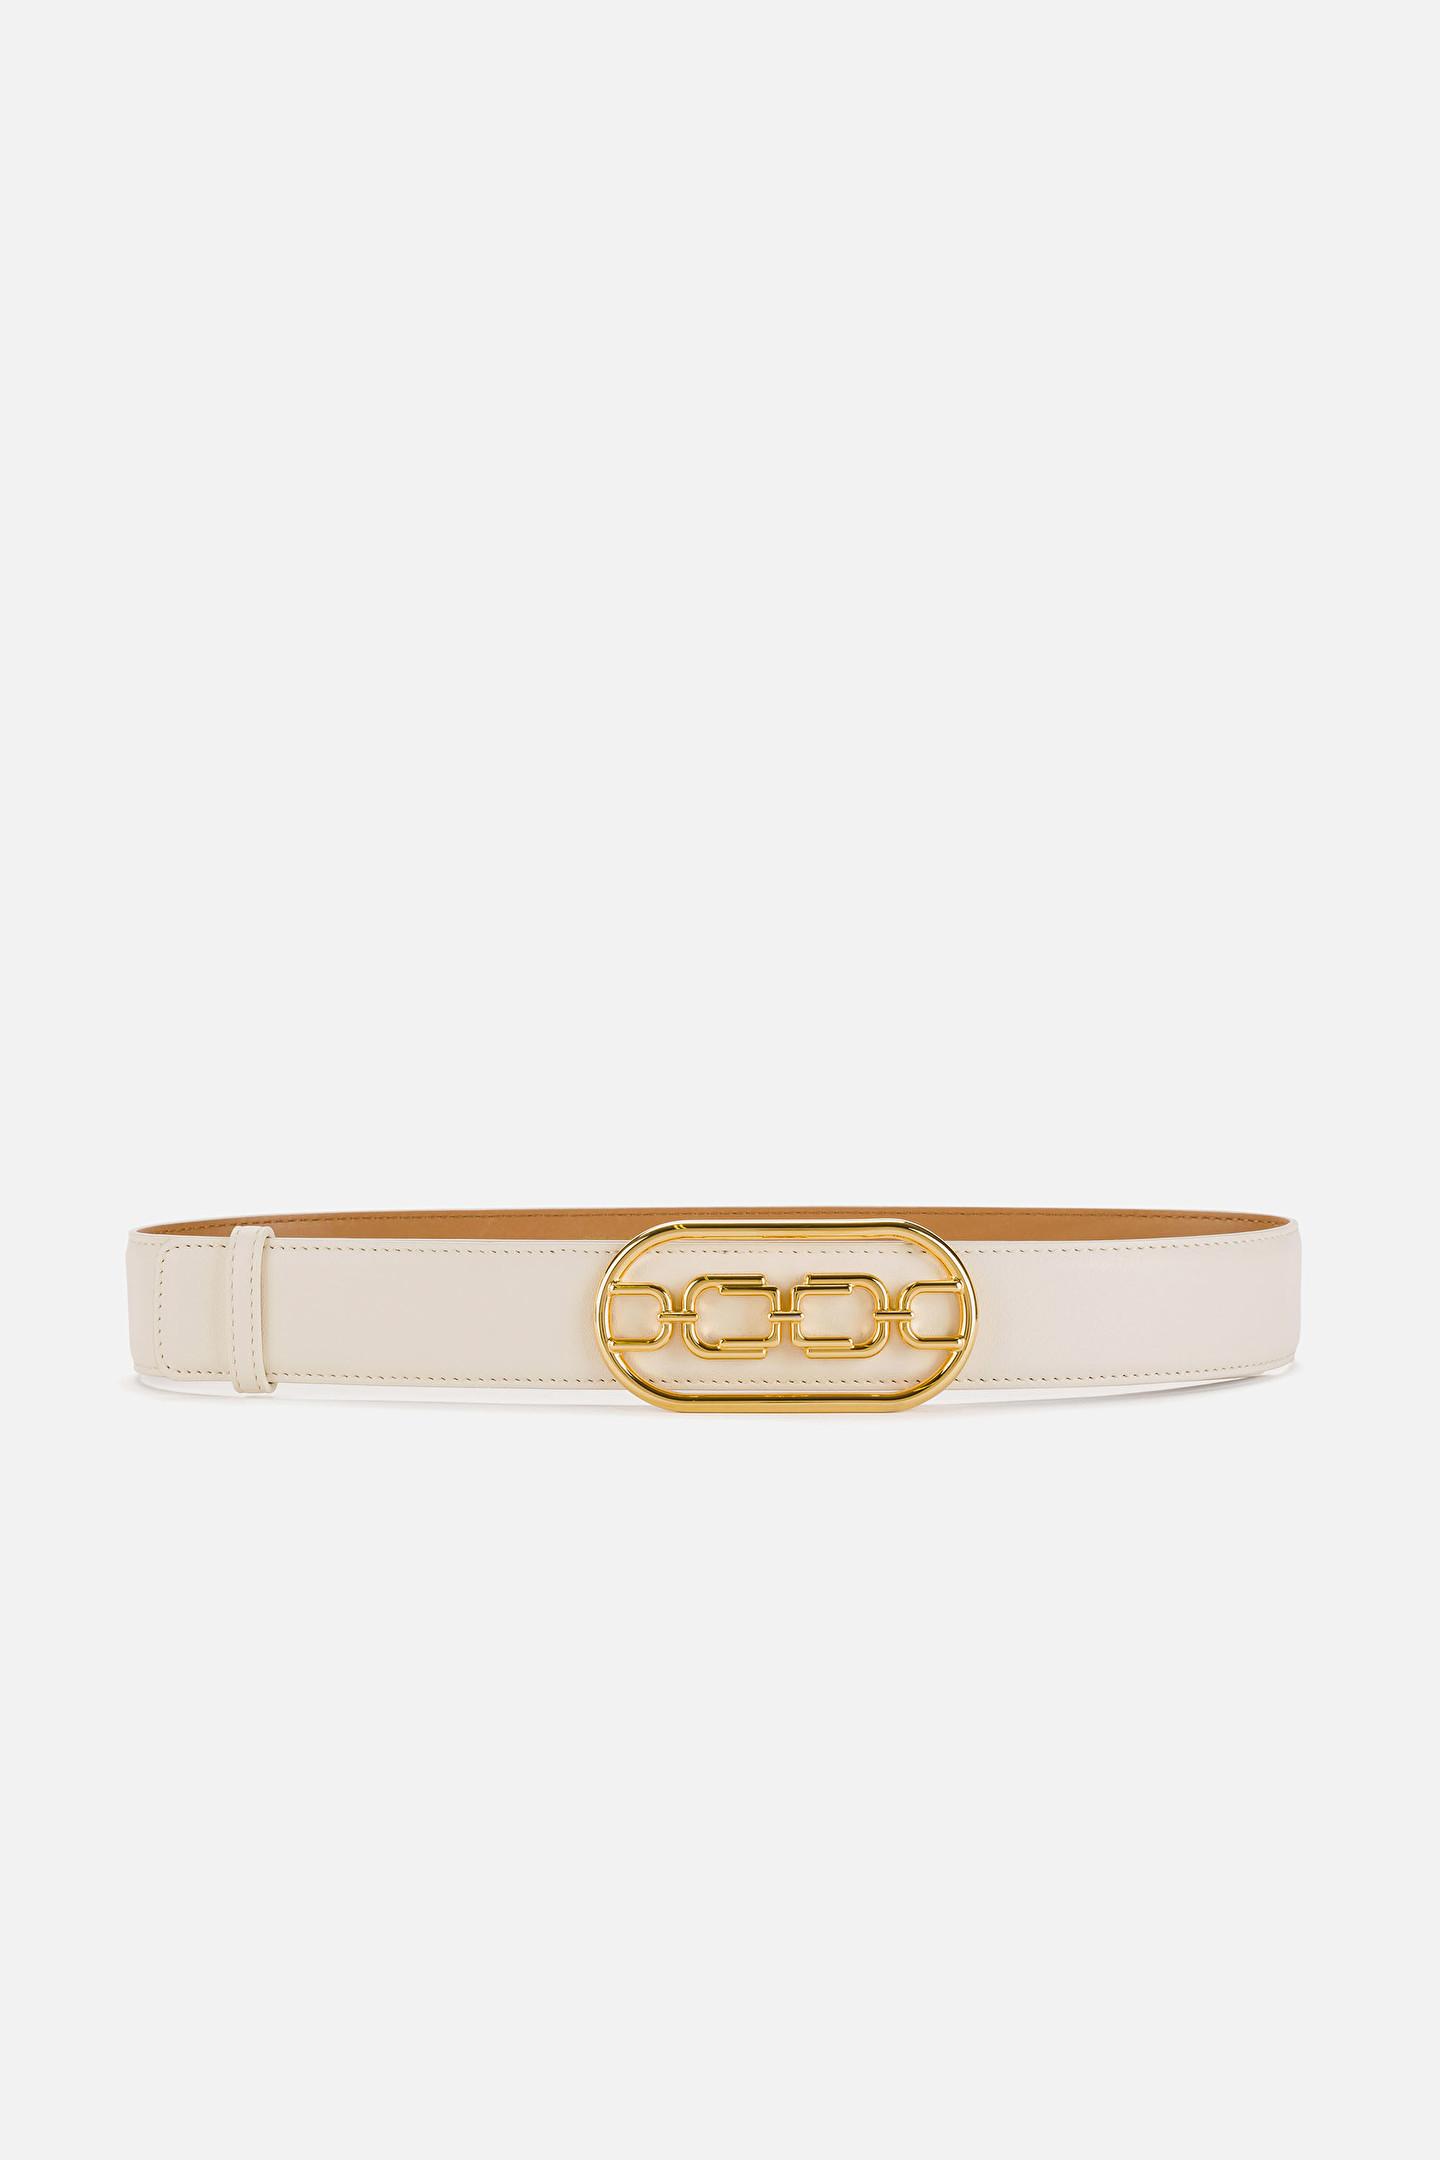 Cintura vita alta con logo light gold Elisabetta Franchi ELISABETTA FRANCHI | Cintura | CT03S11E2193